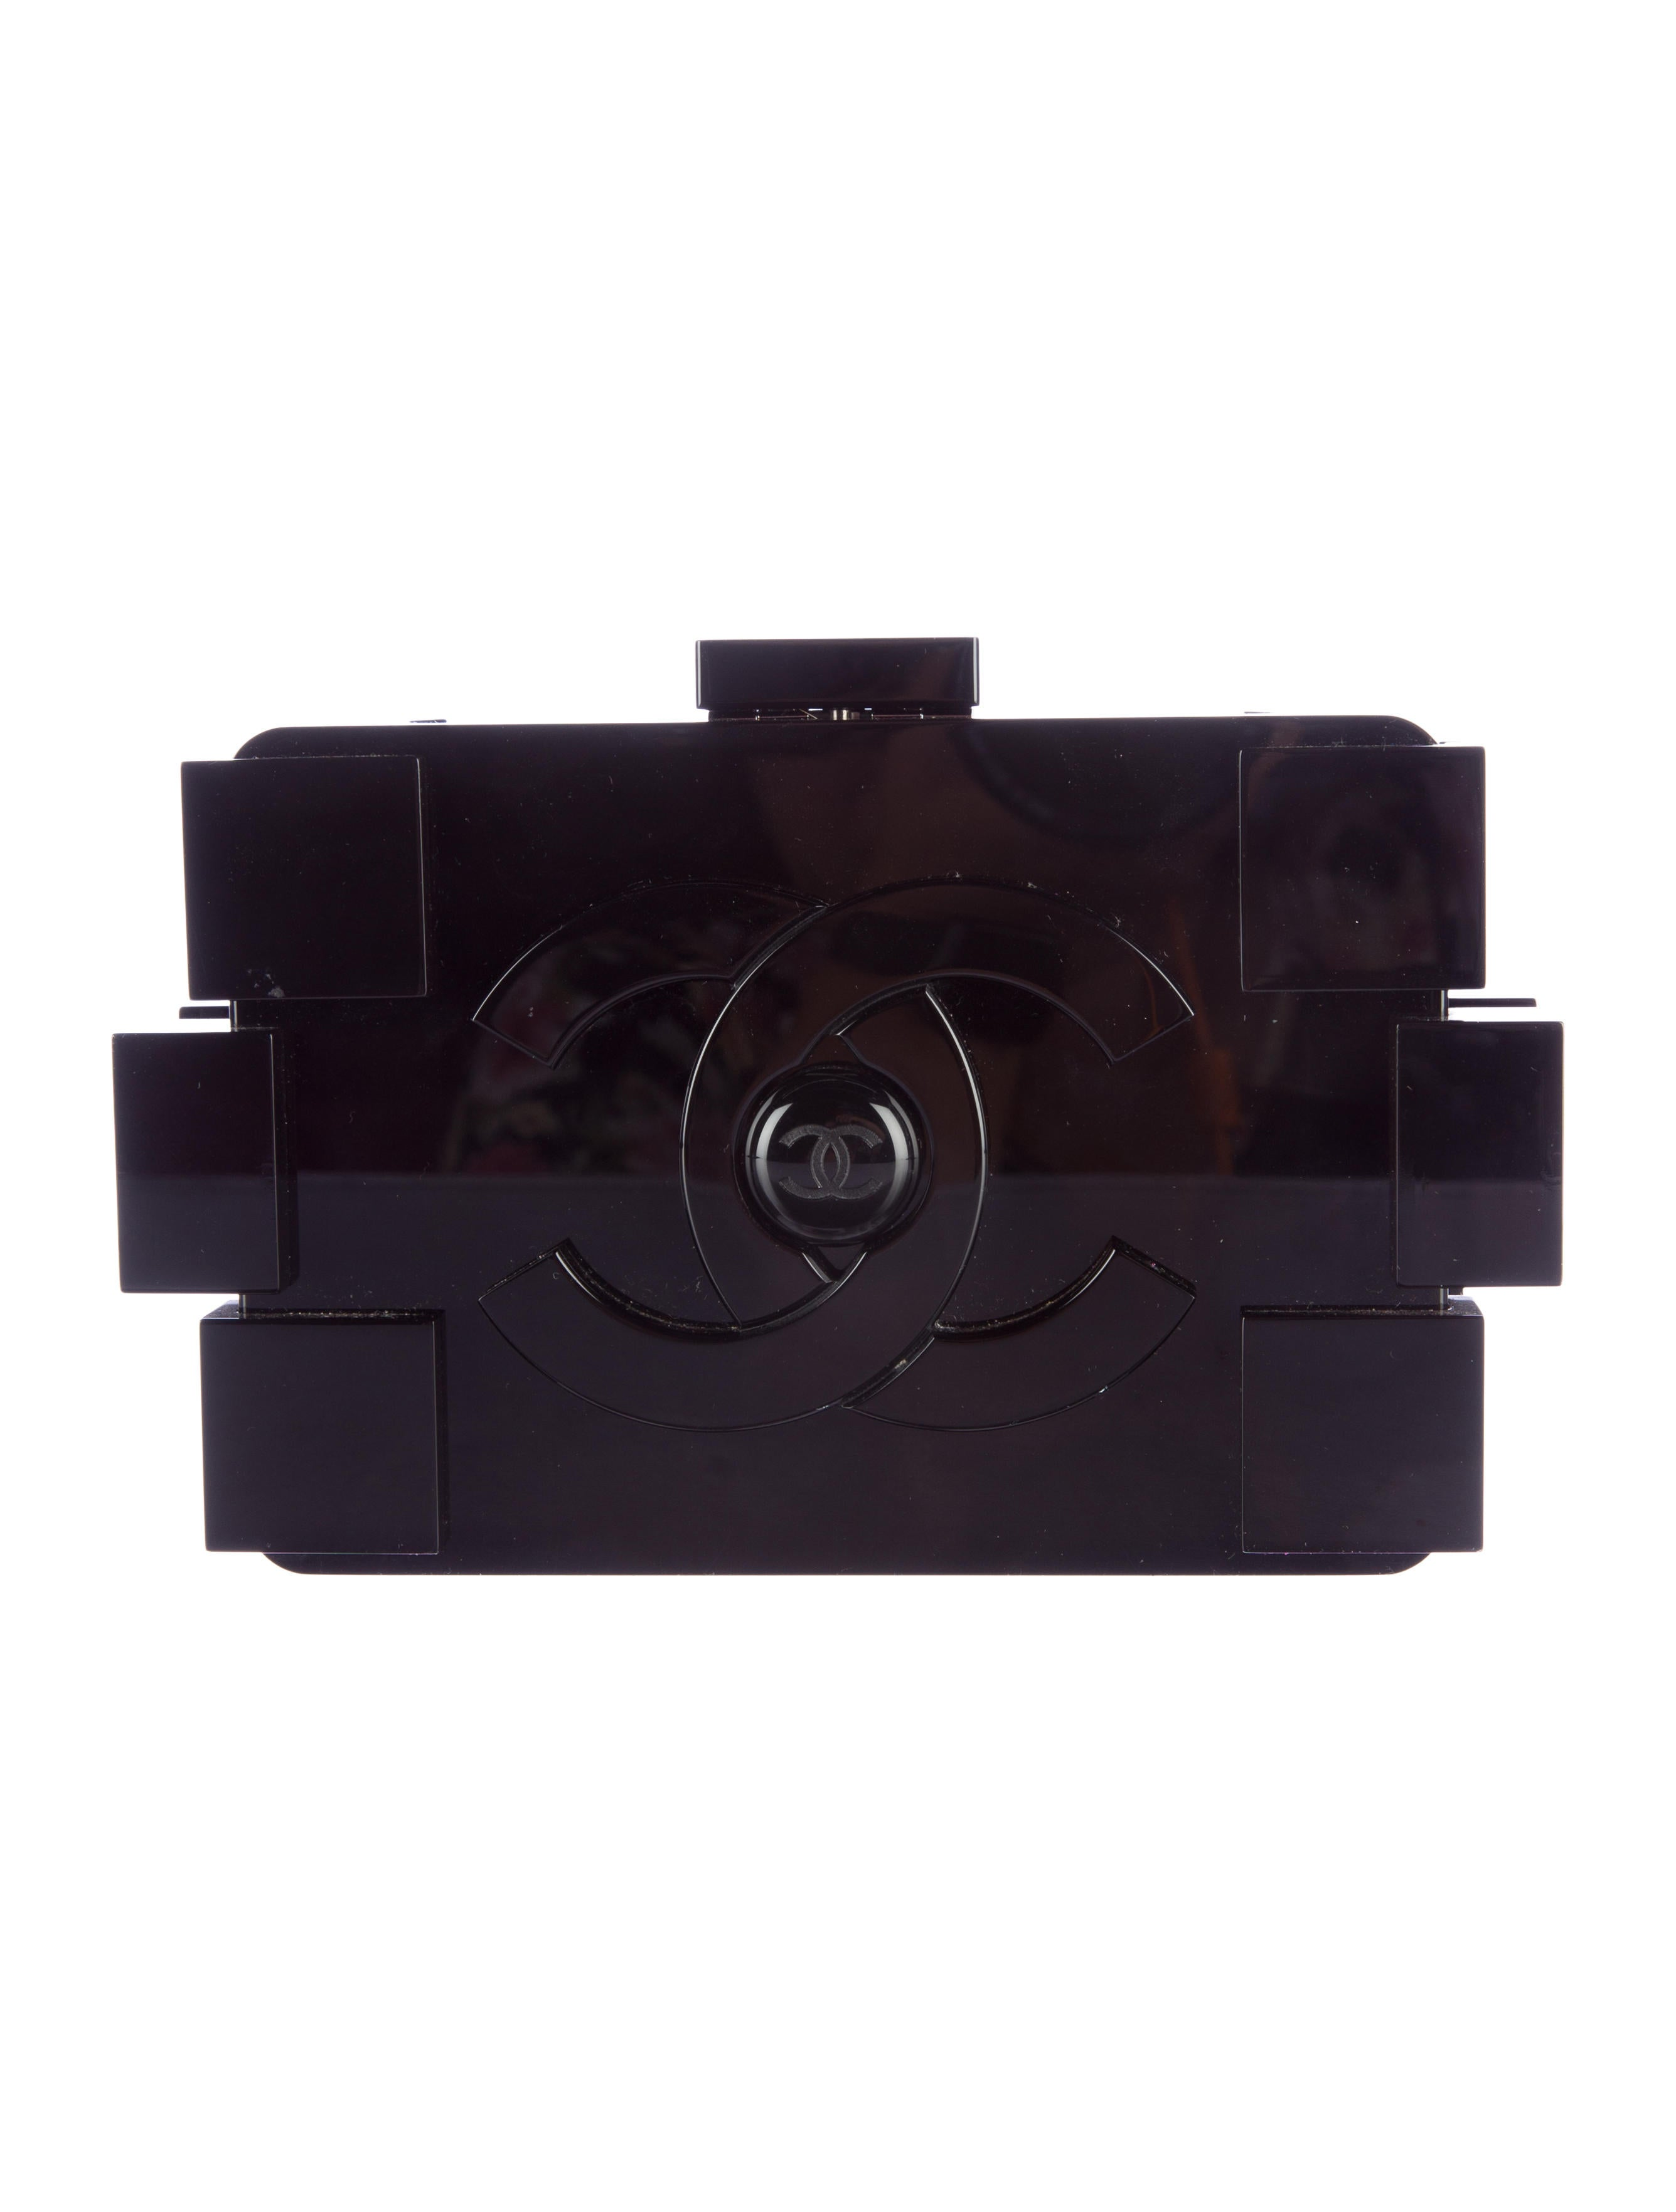 Chanel Coco Lego Clutch - Handbags - CHA108223 | The RealReal